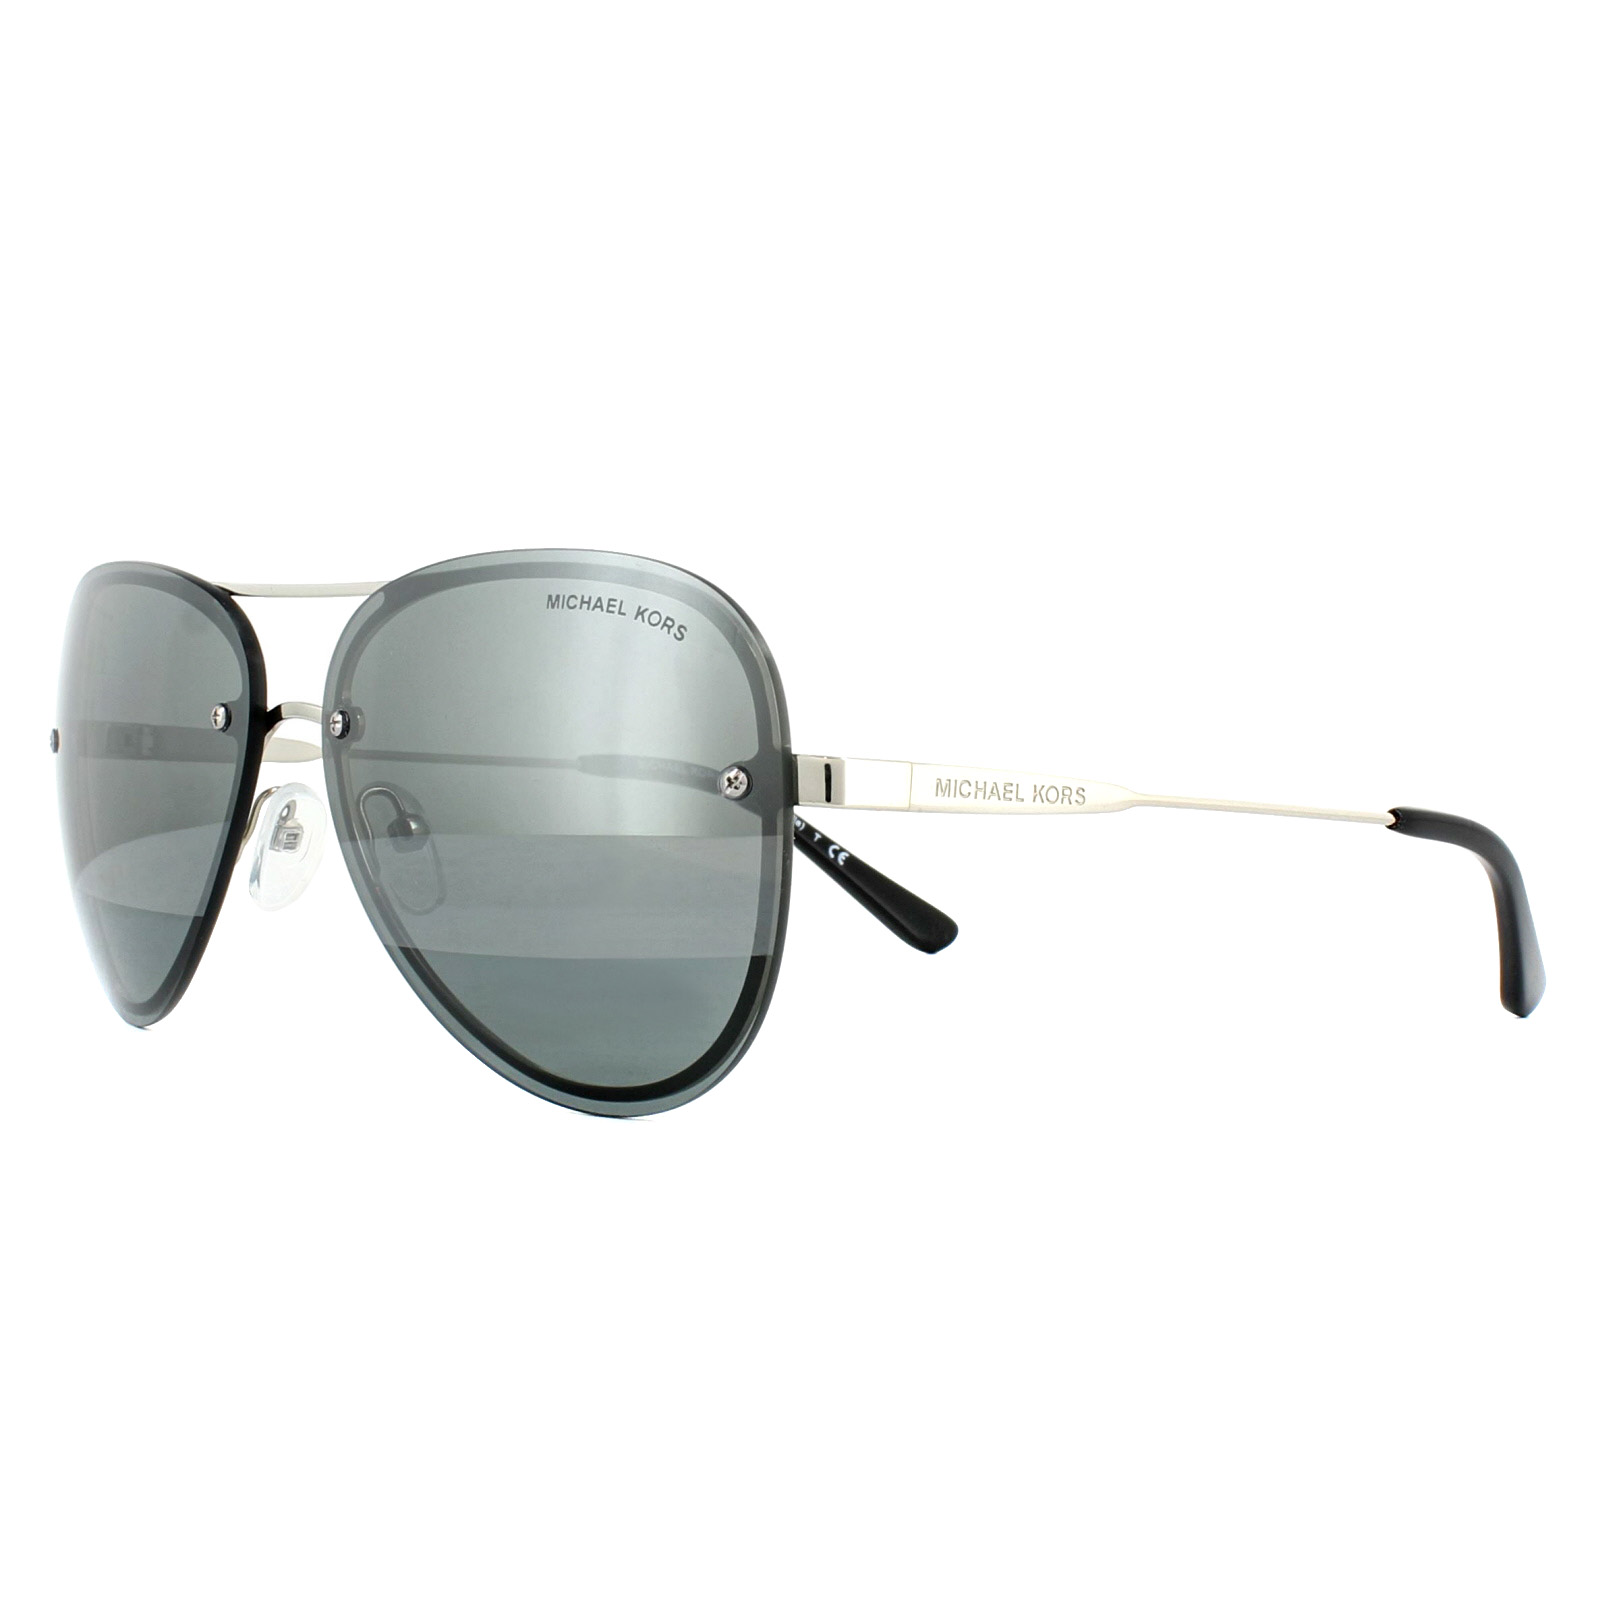 Details about Michael Kors Sunglasses La Jolla MK1026 11181Y Silver Tone Block Gunmetal Mirror